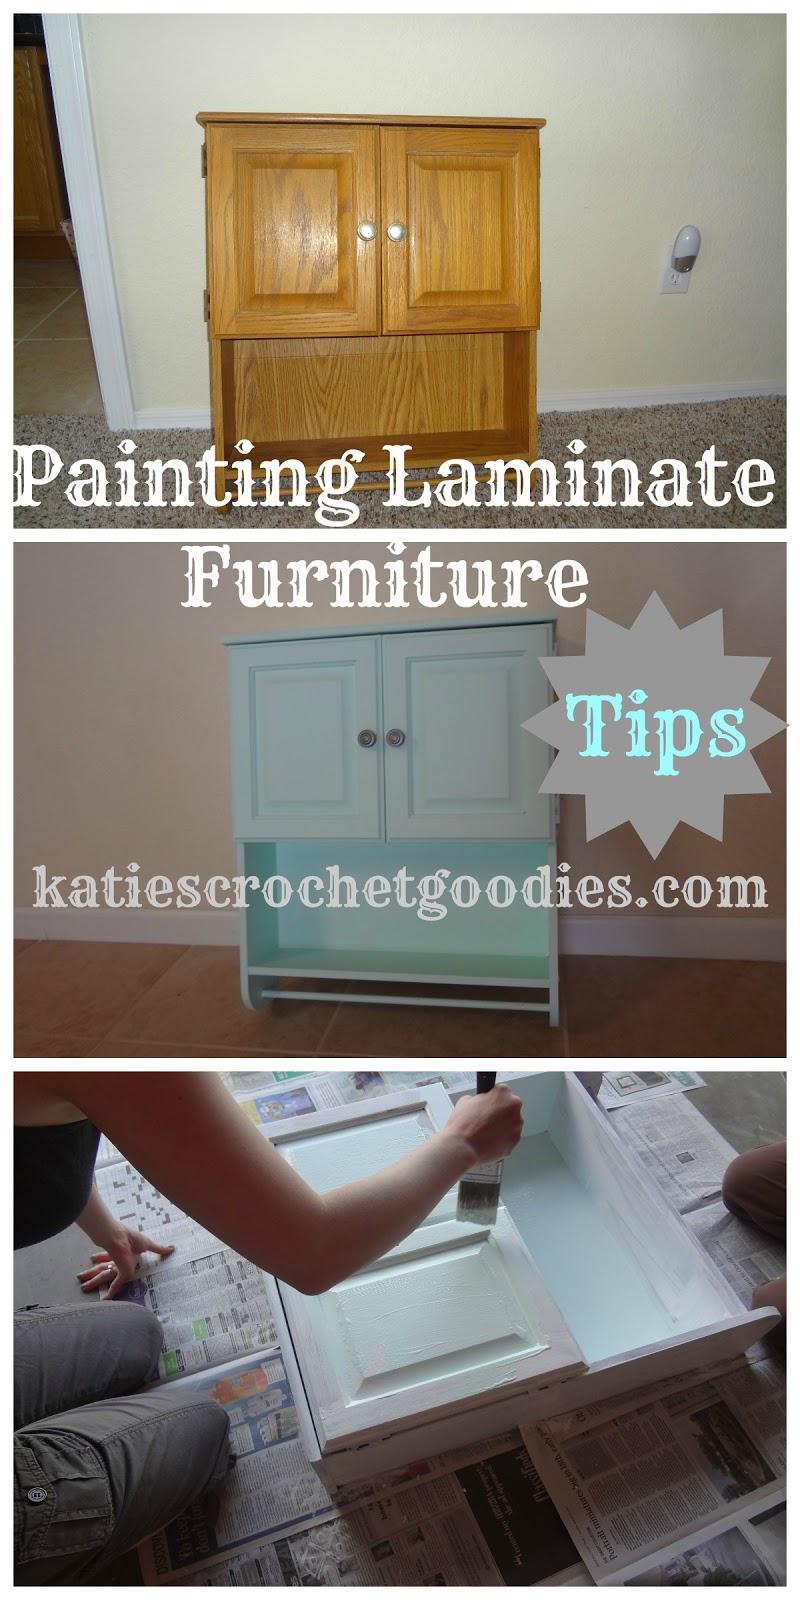 painting laminate furniturePainting Laminate Furniture DIY  Katies Crochet Goodies